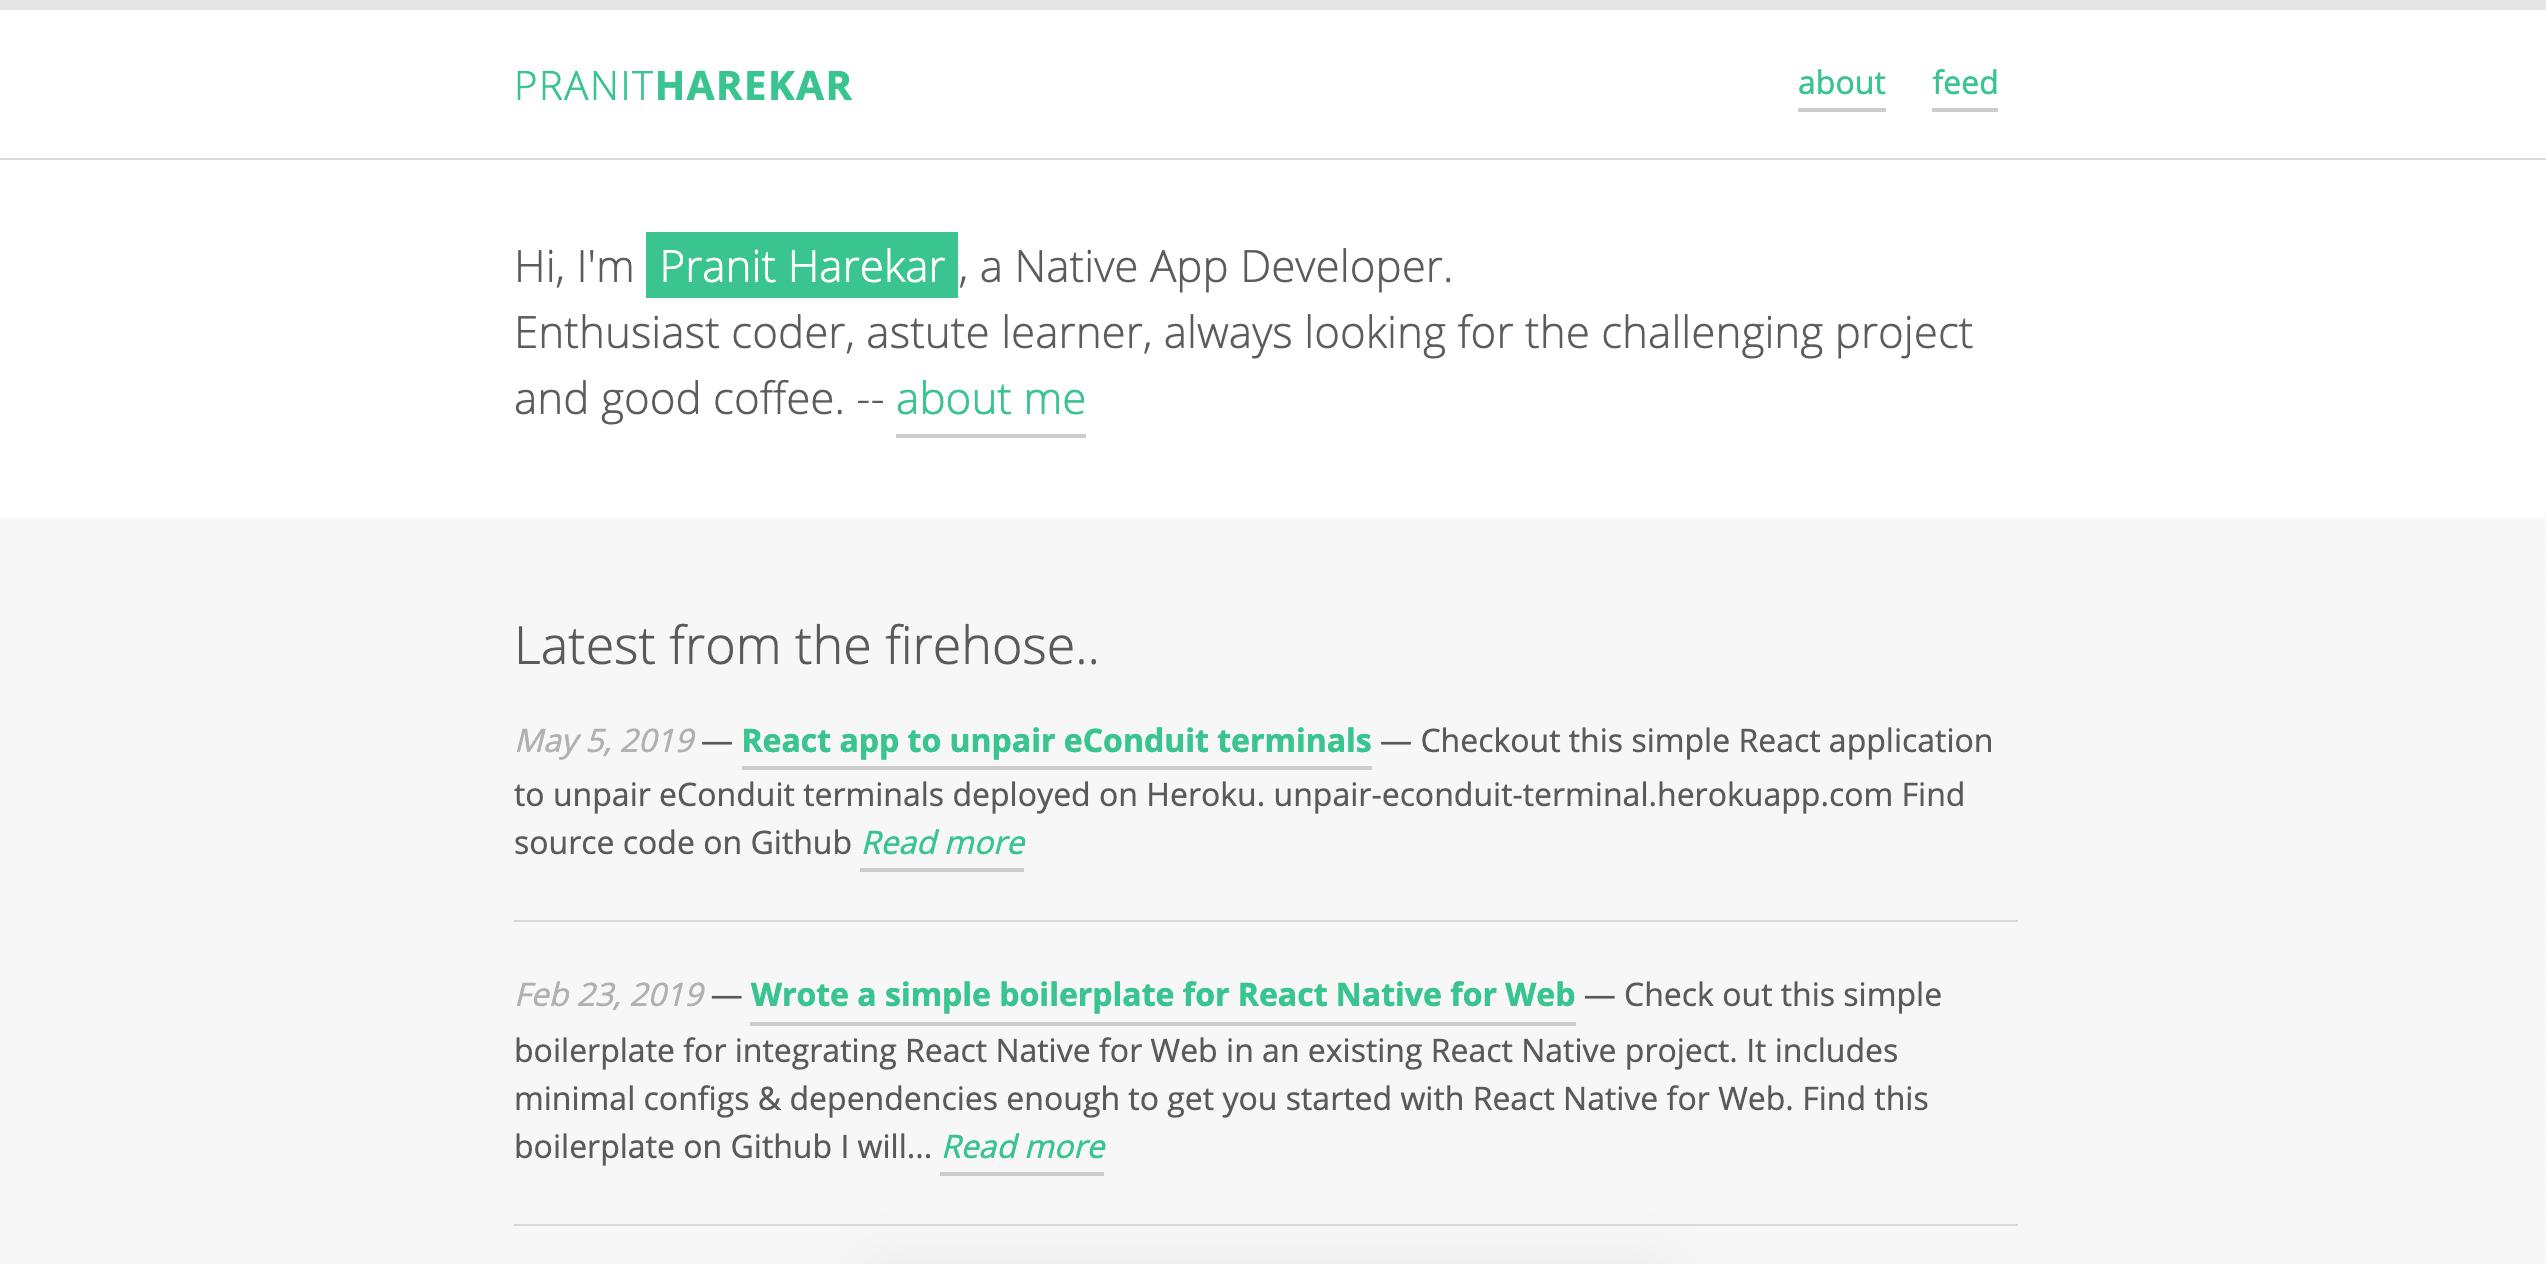 Open-sourced my personal portfolio website   Pranit Harekar